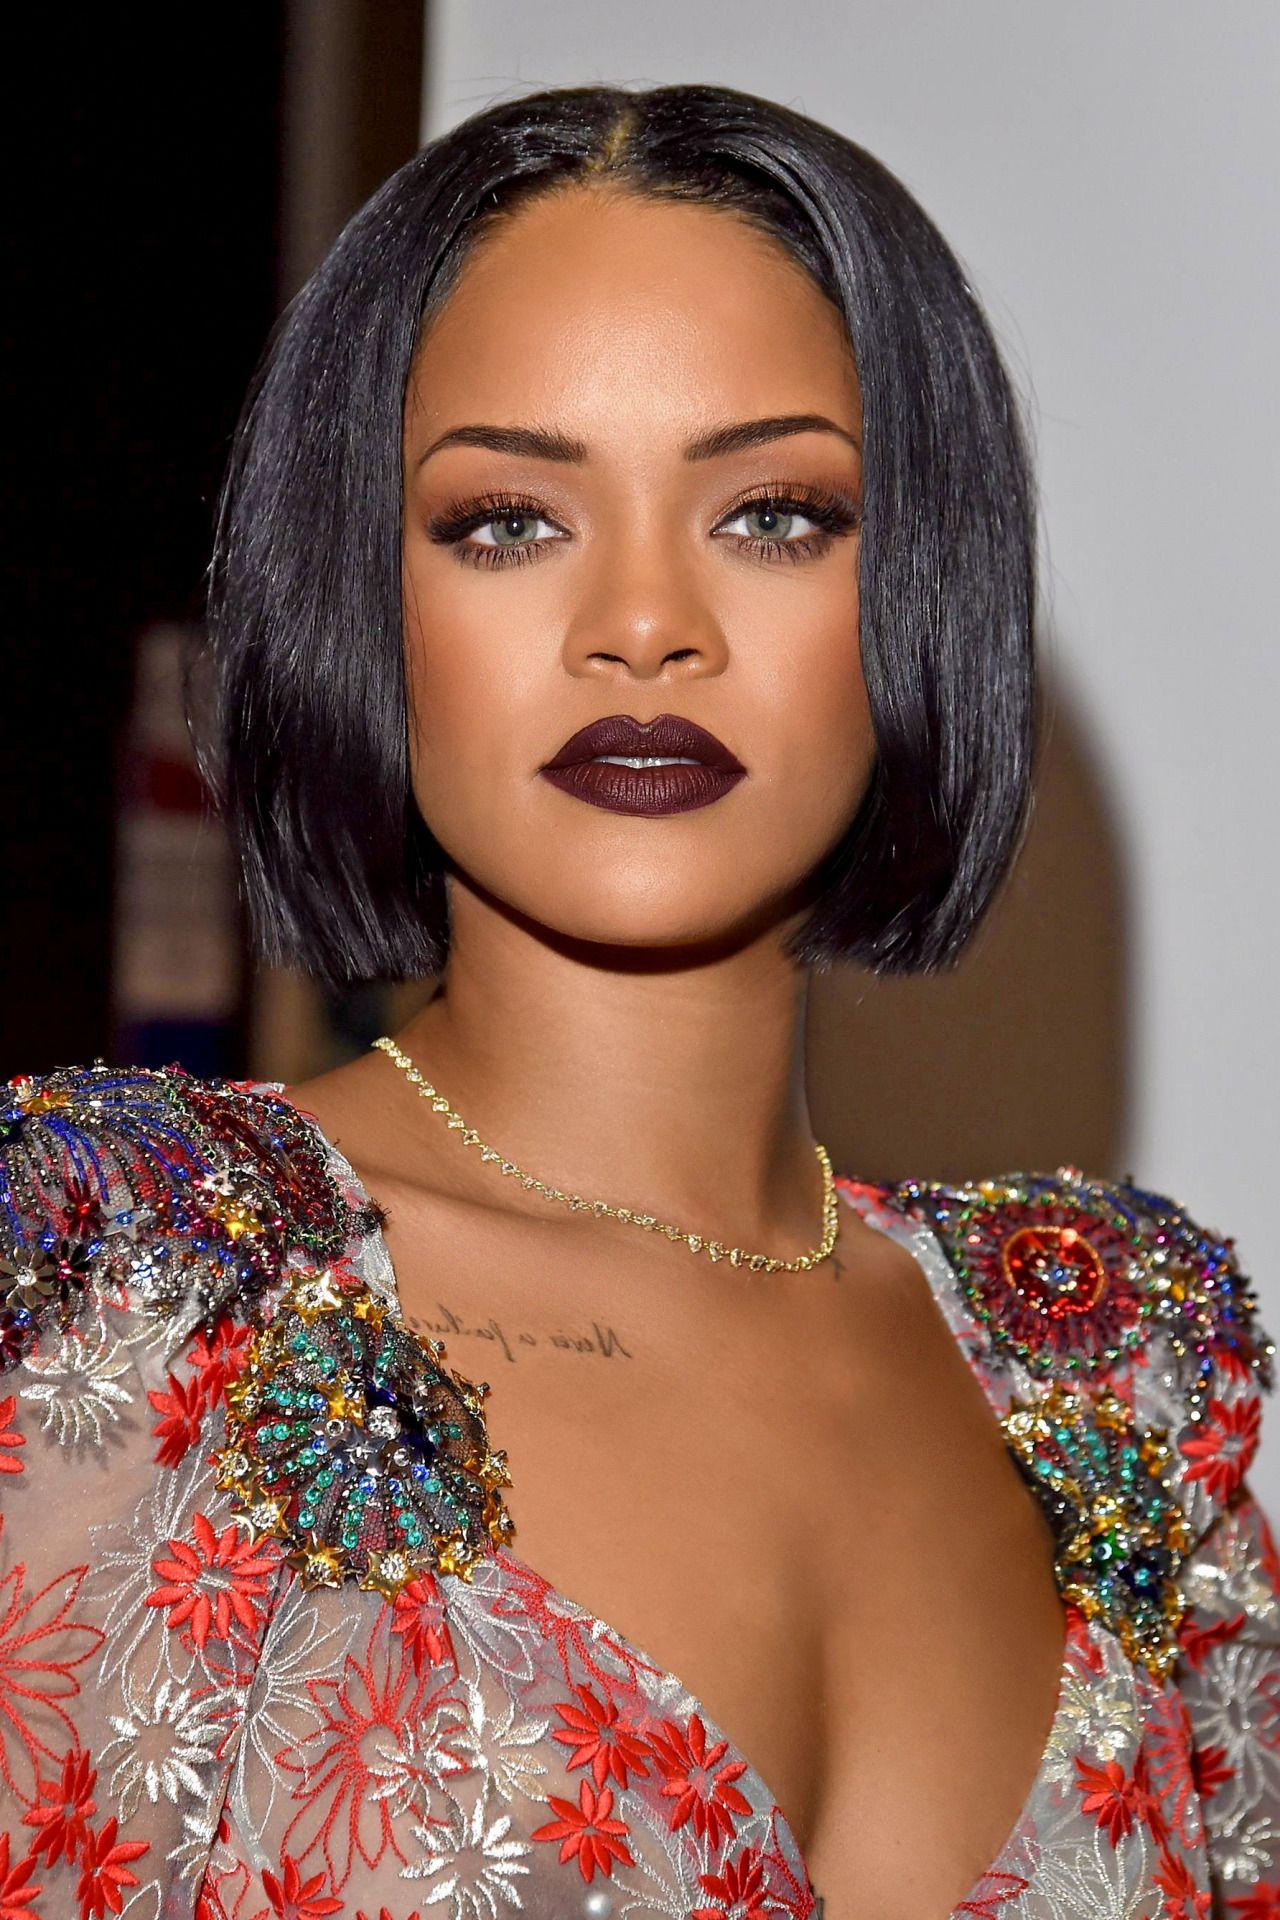 @ Jassstayblazed | Rihanna Fenty | Rihanna makeup, Rihanna ...